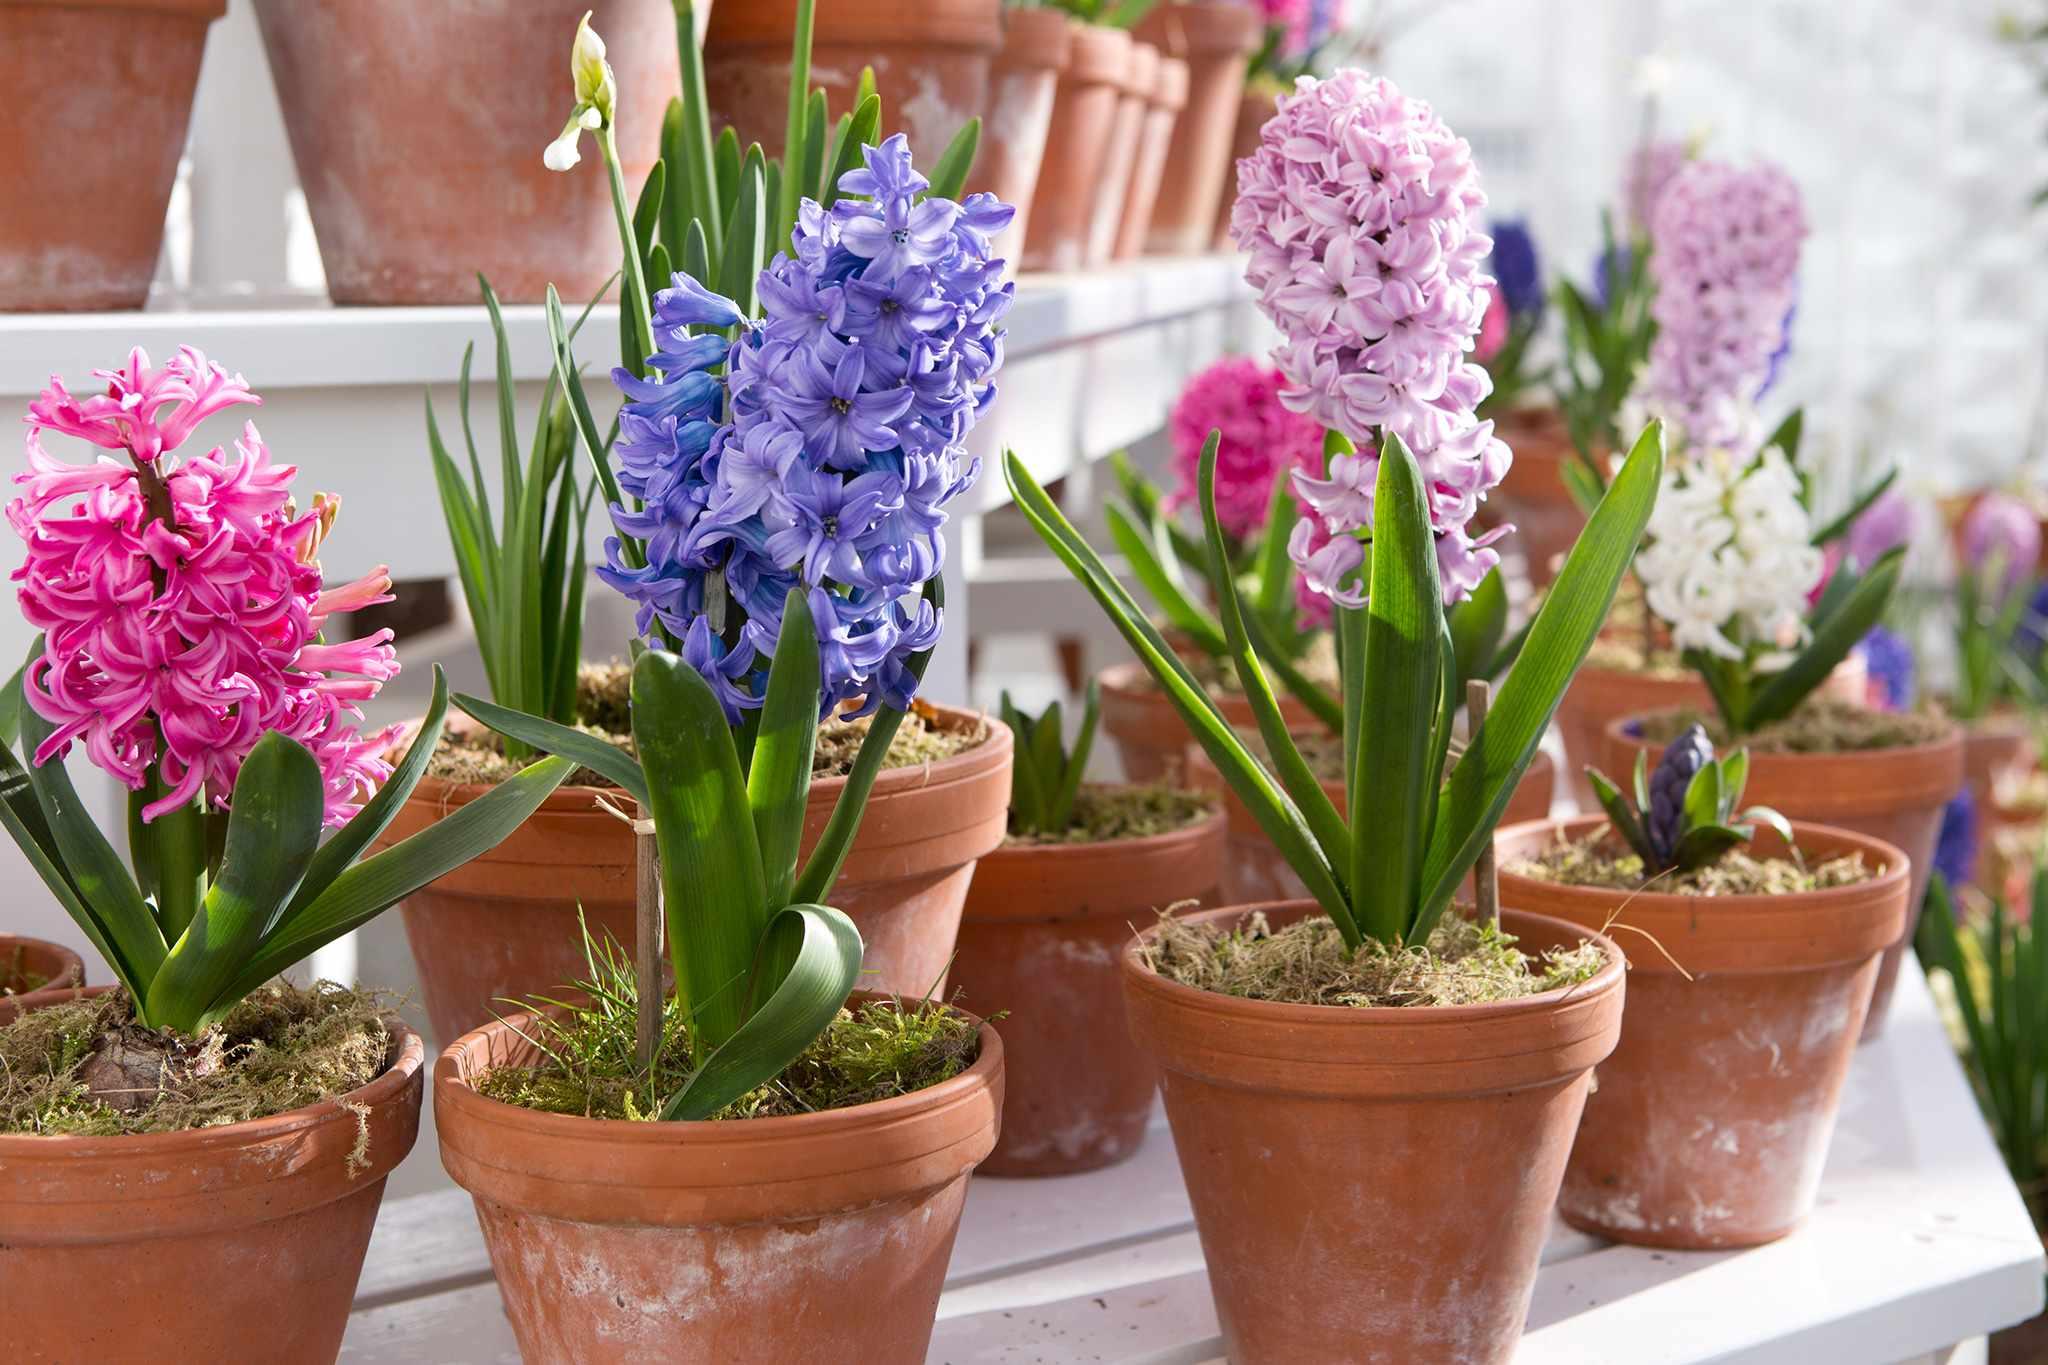 Hyacinths in pots